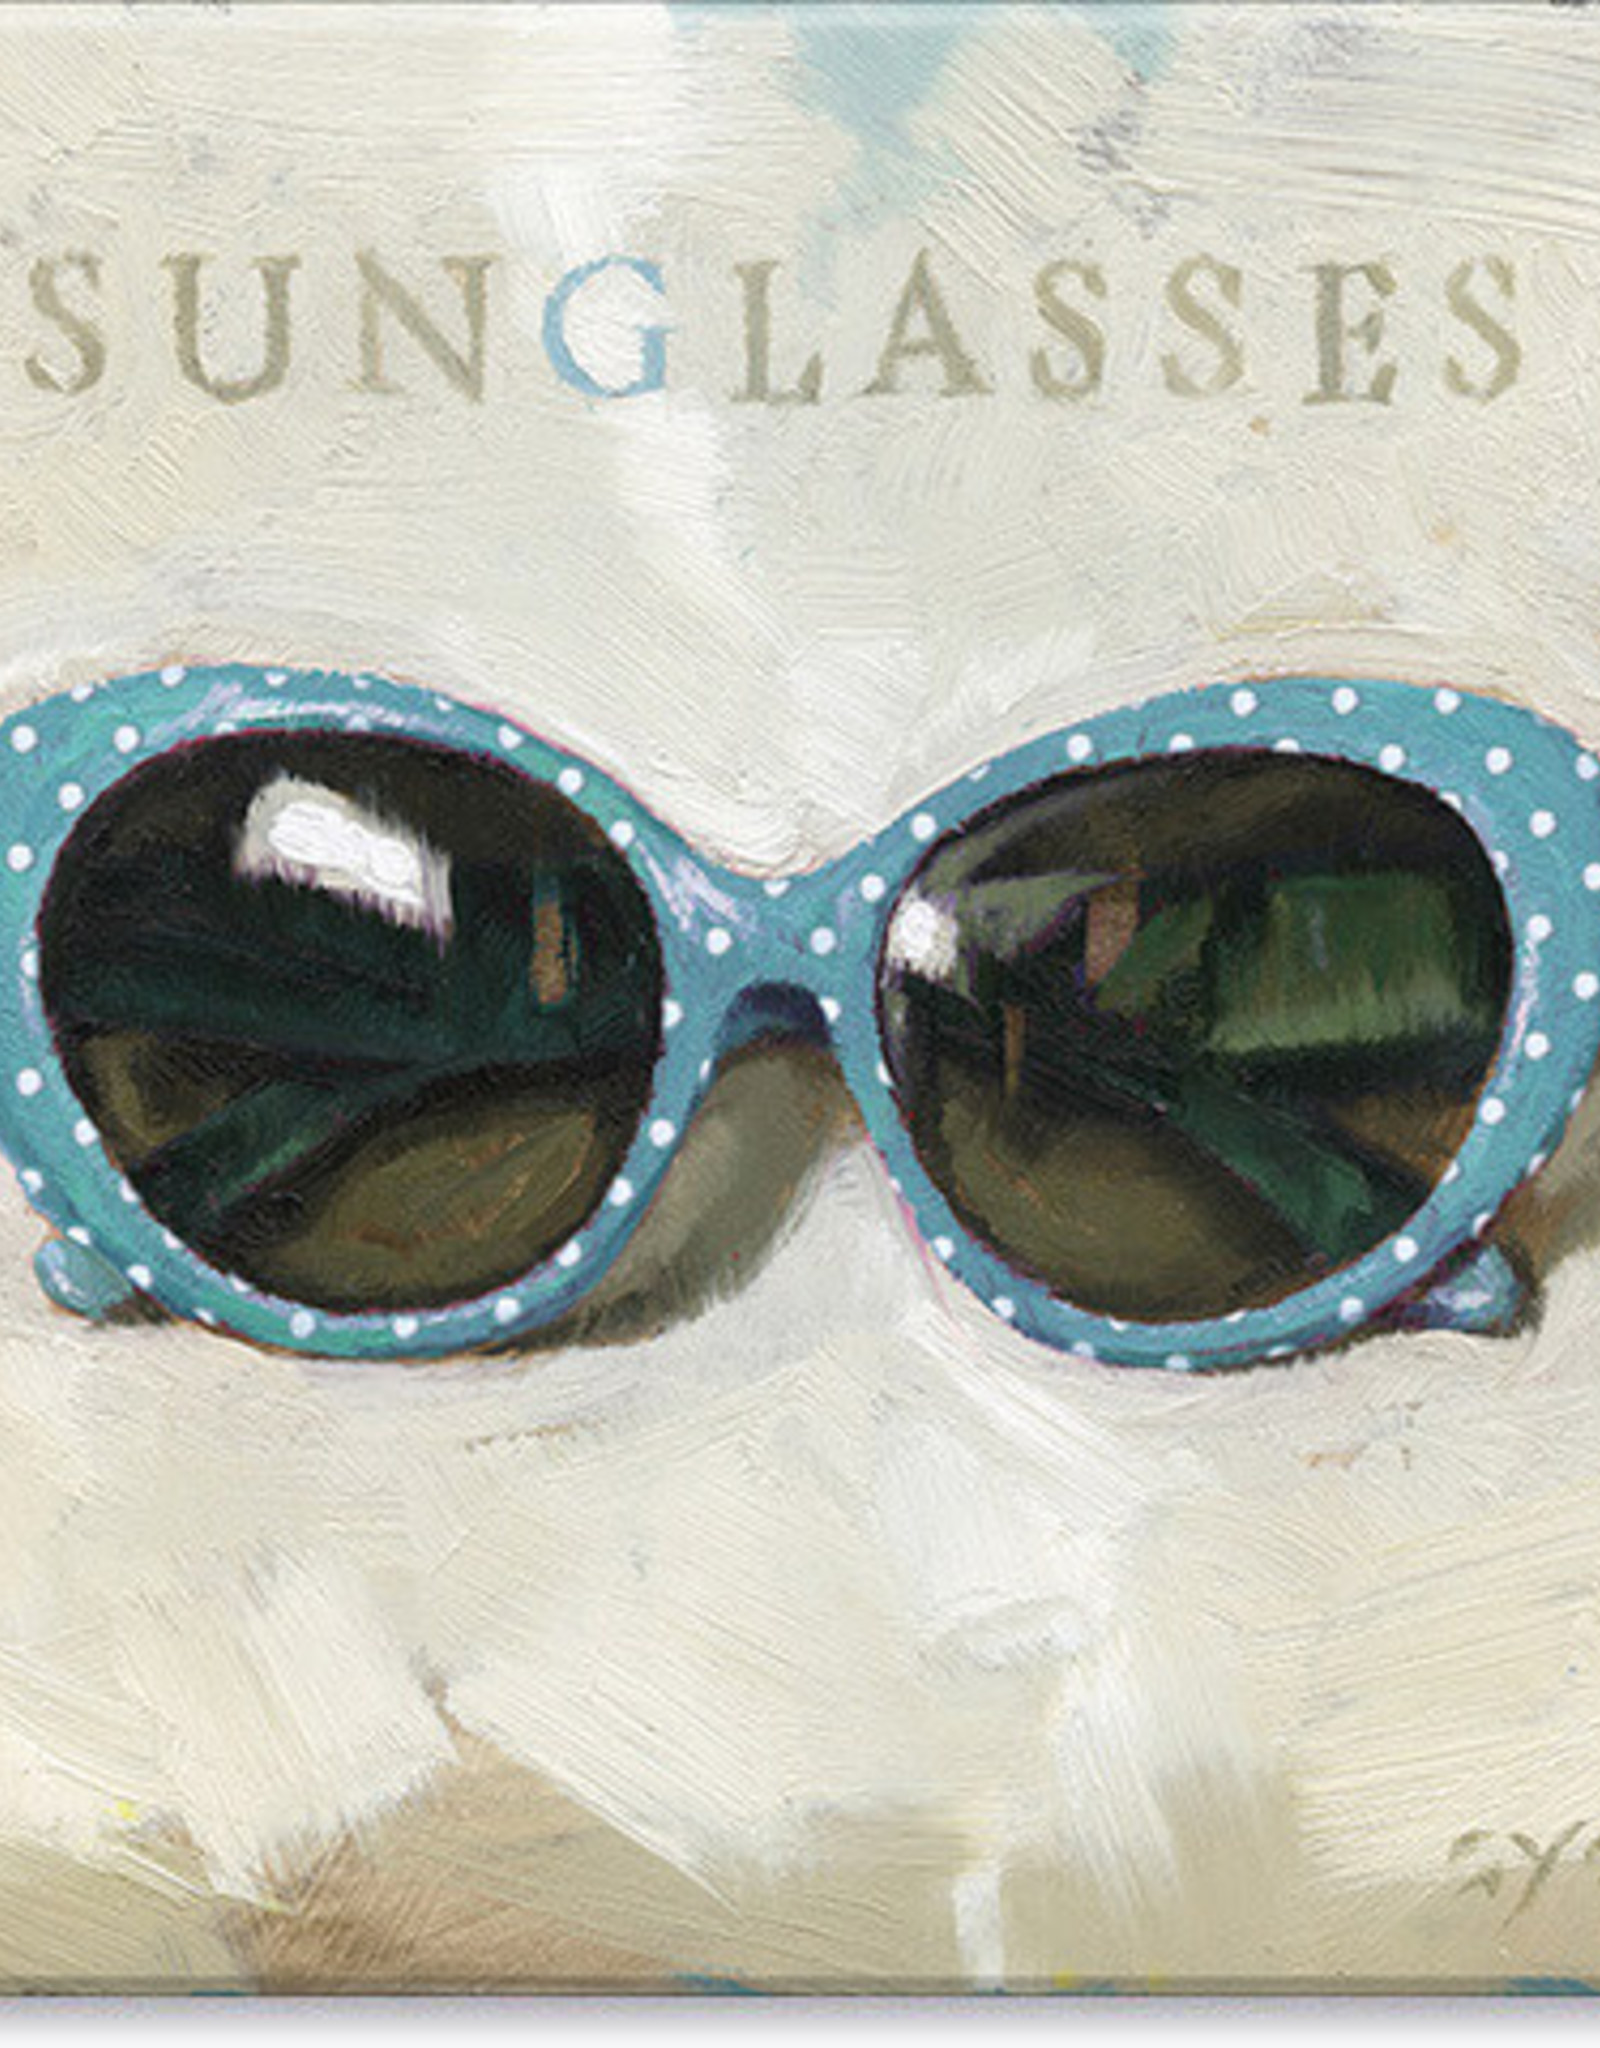 Sullivans Sunglasses Giclee Wall Art 9x9